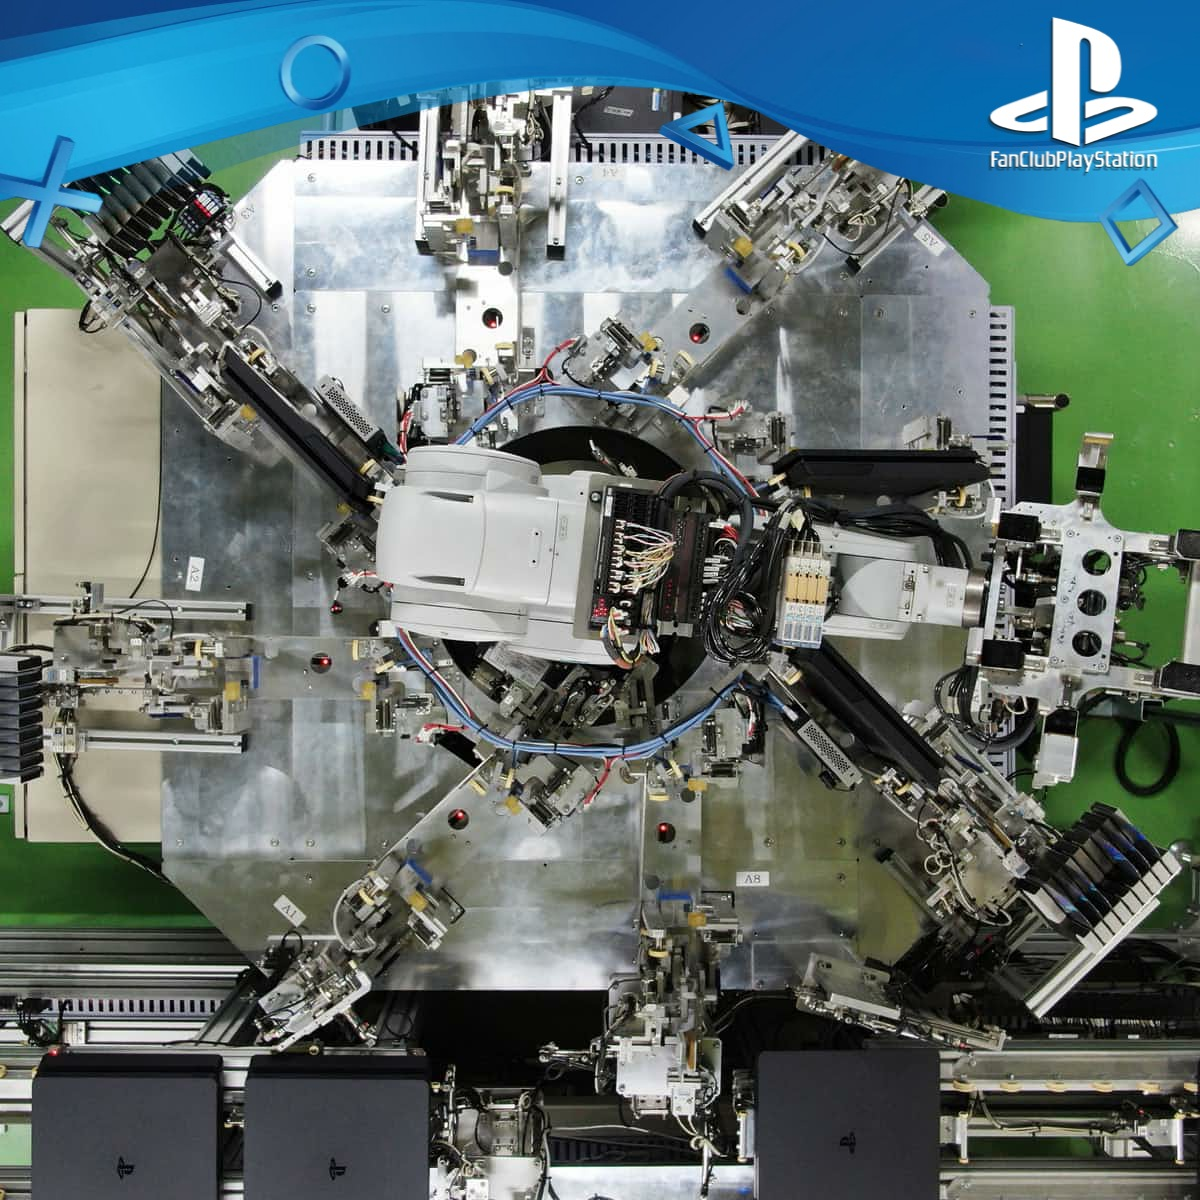 12 PS4 Robot vue du haut